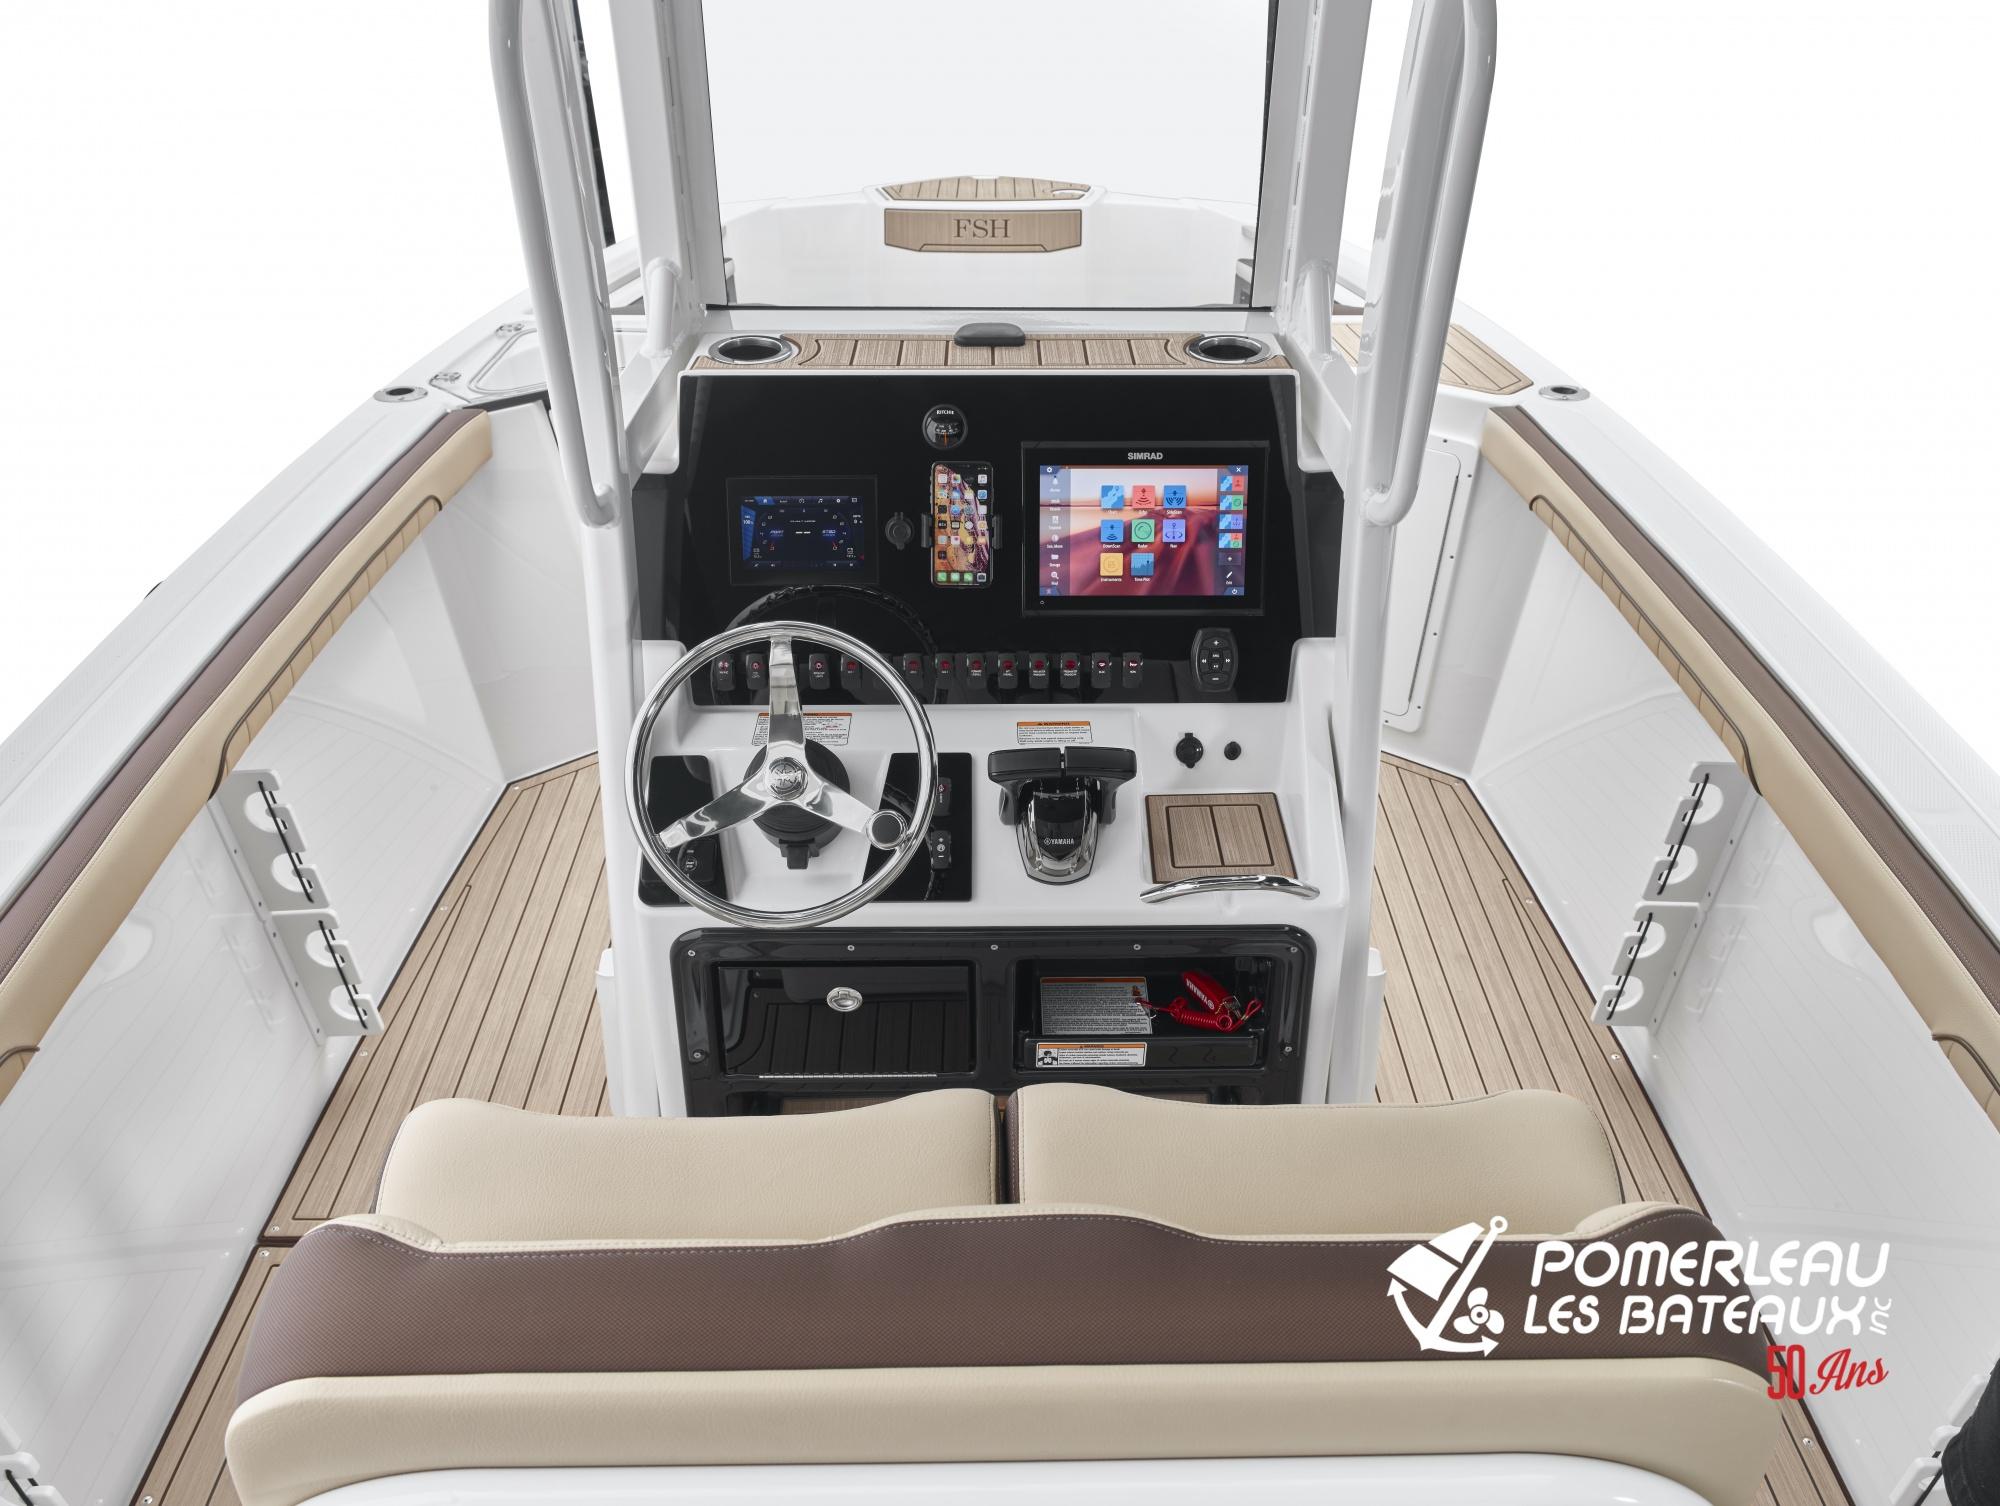 Yamaha 255 FSH SportE - 2021_255FSHSportE_Detail_Helm-screen3